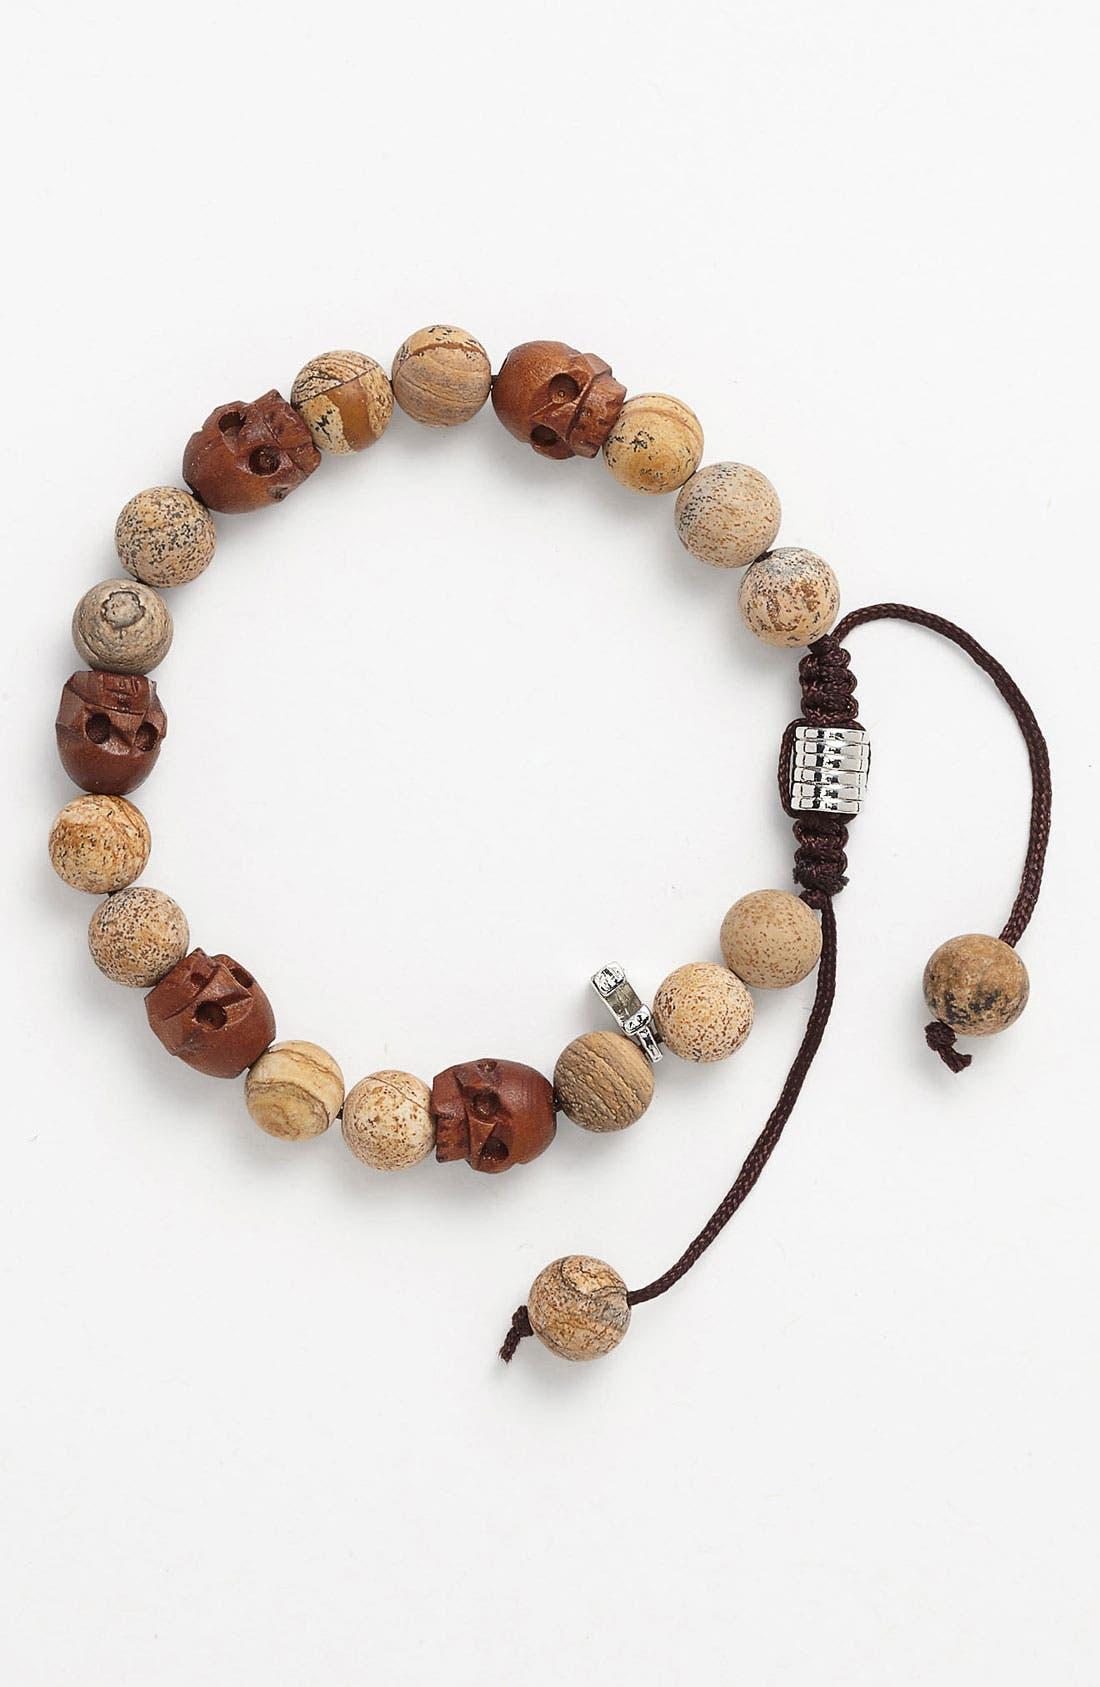 Alternate Image 1 Selected - Zack Beaded Hemp Bracelet